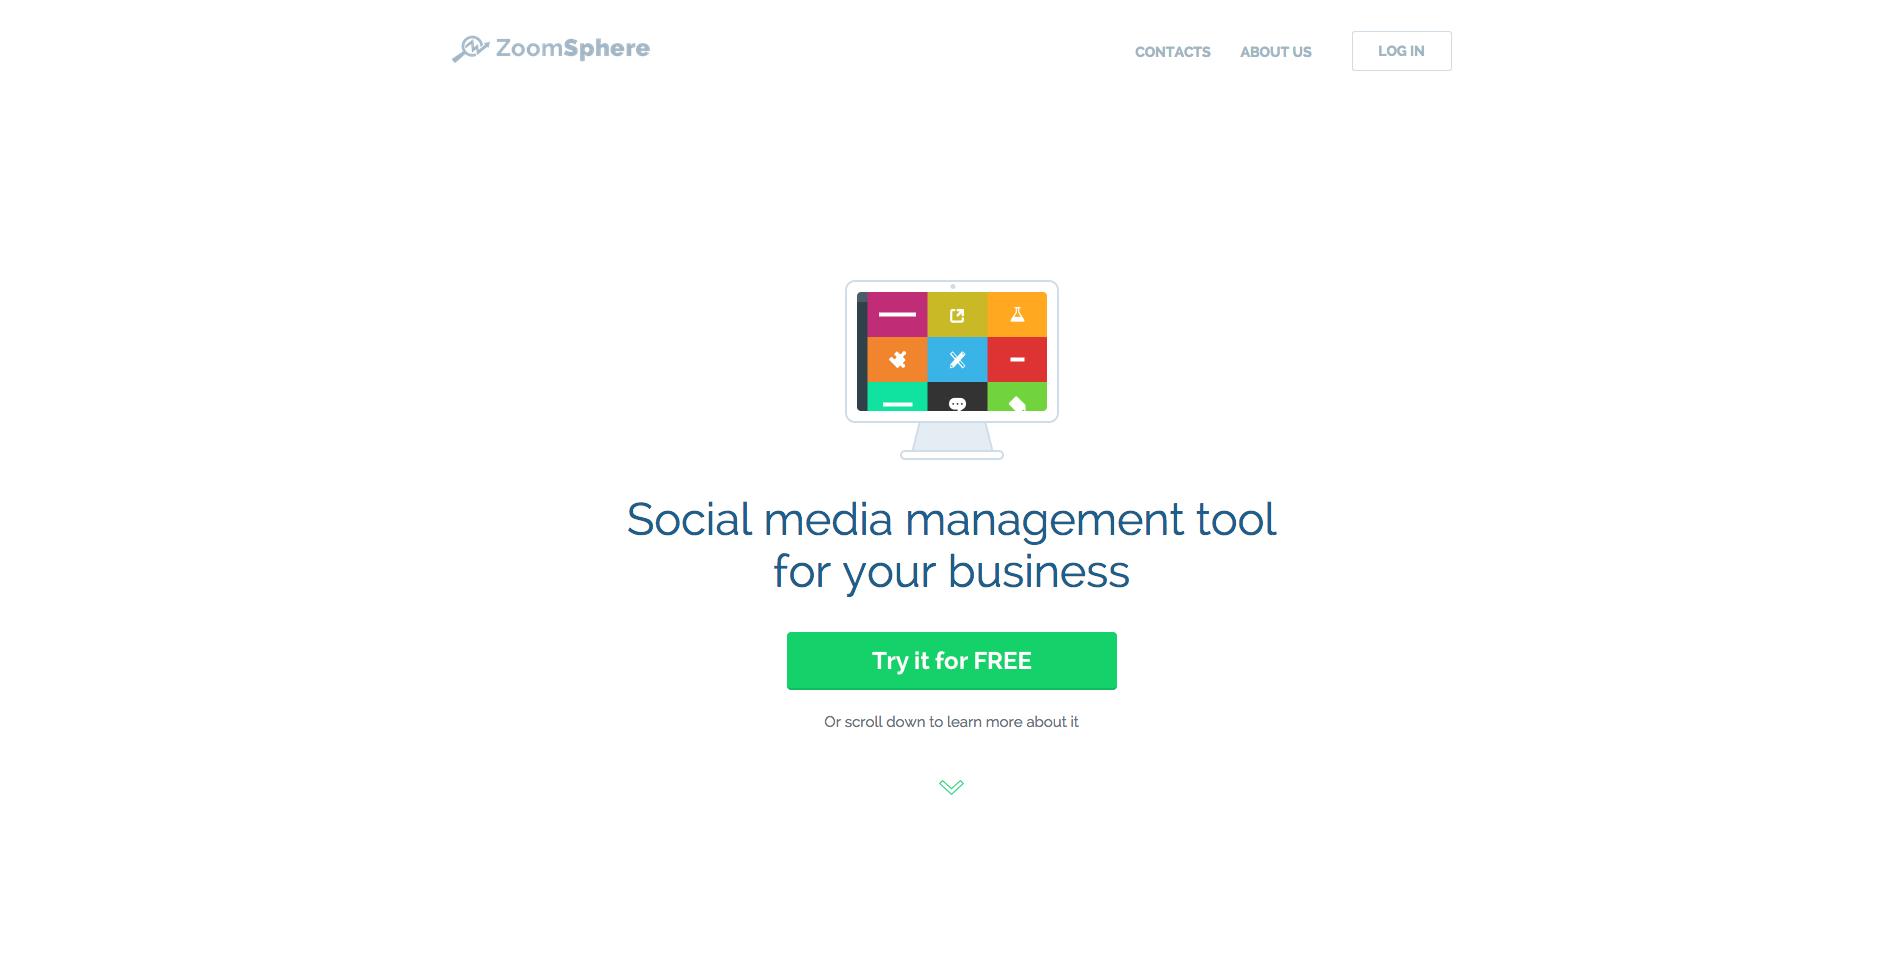 Náhled homepage ZoomSphere